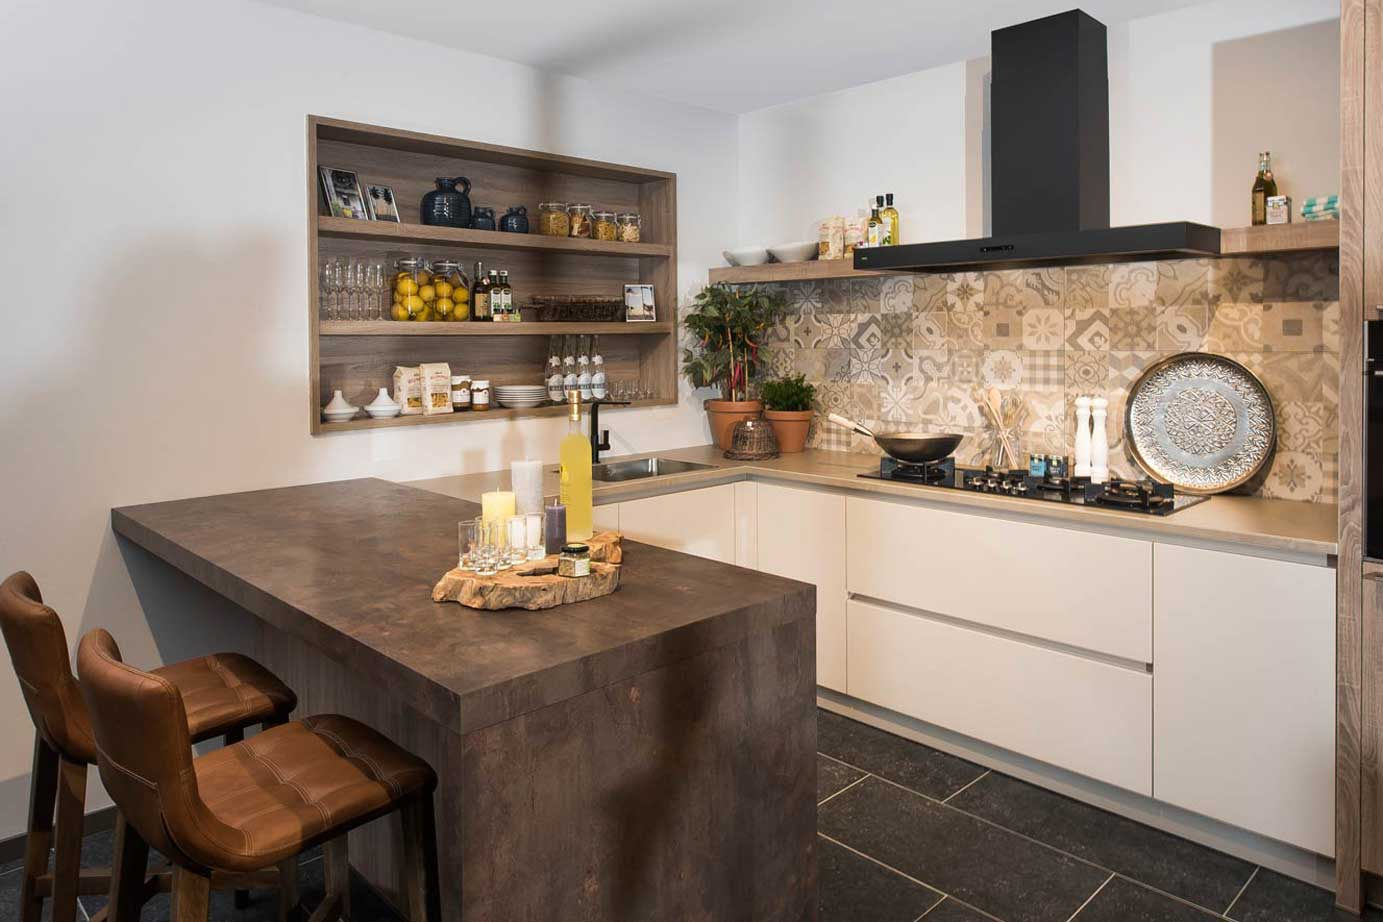 Keuken Moderne Bar : Keuken ontwerpen informatie die u vooraf moet weten db keukens